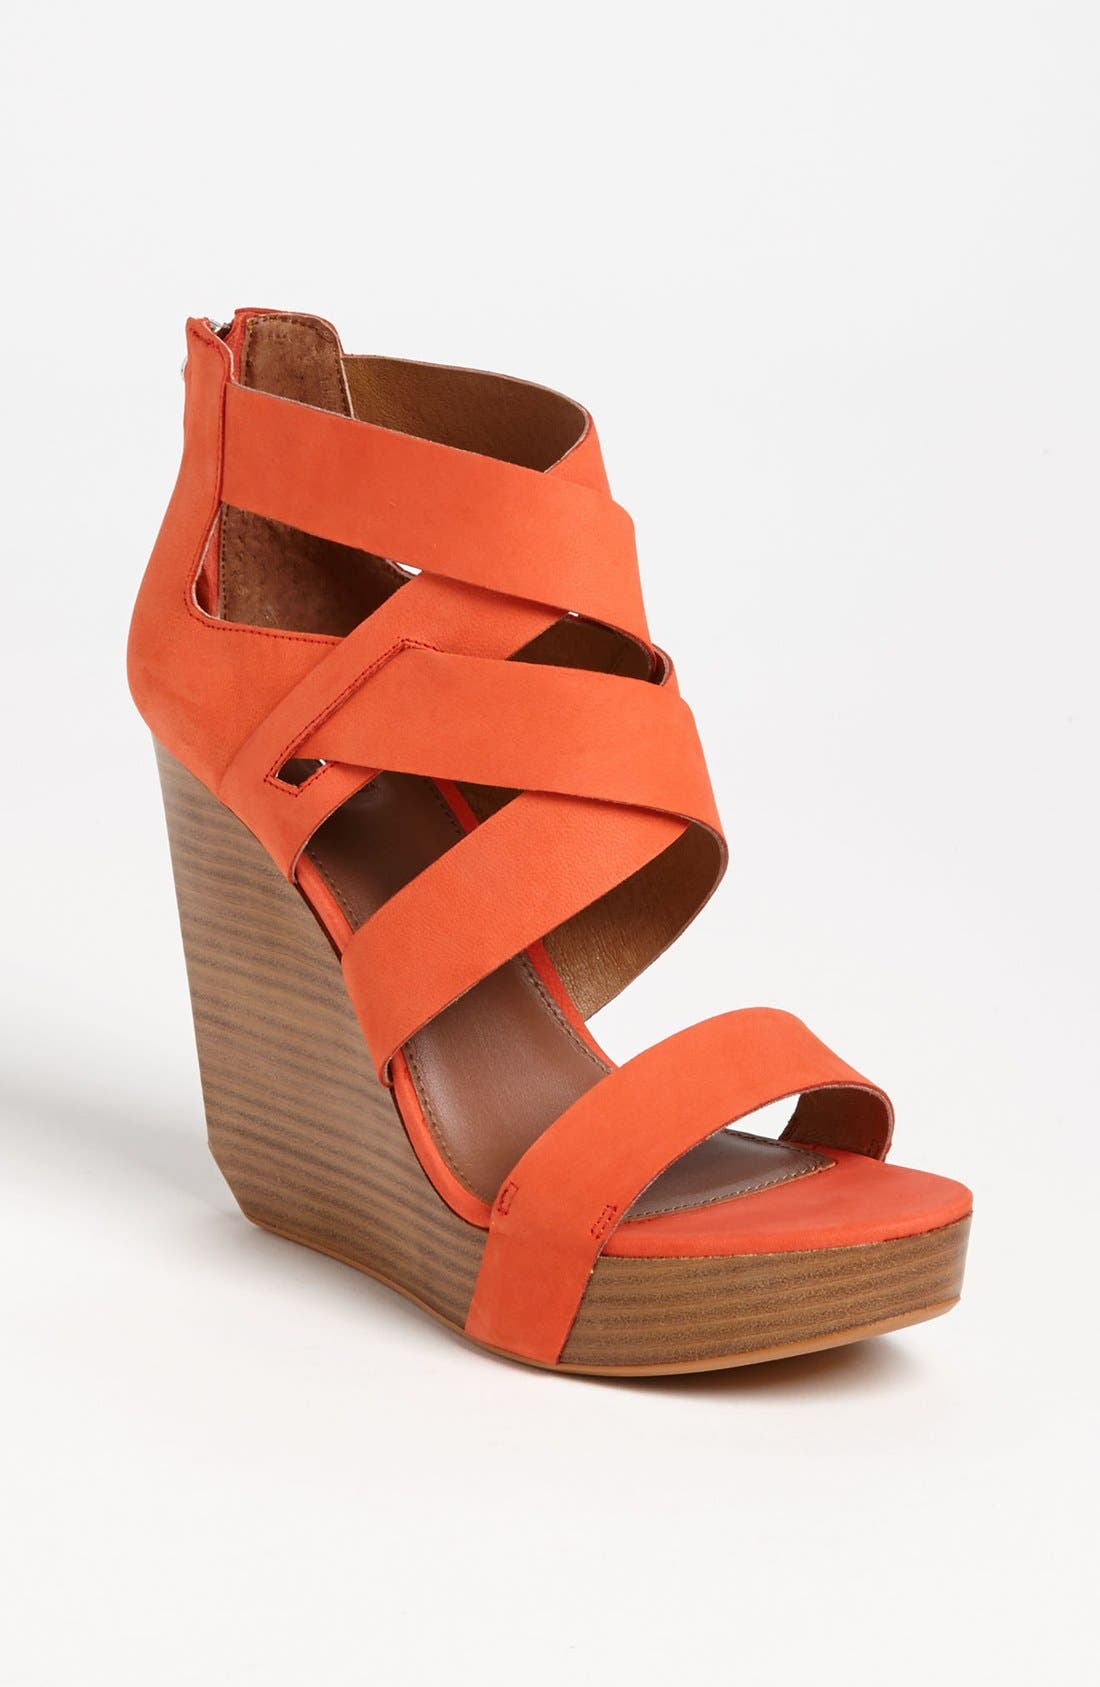 Main Image - Matiko 'Crisscross' Wedge Sandal